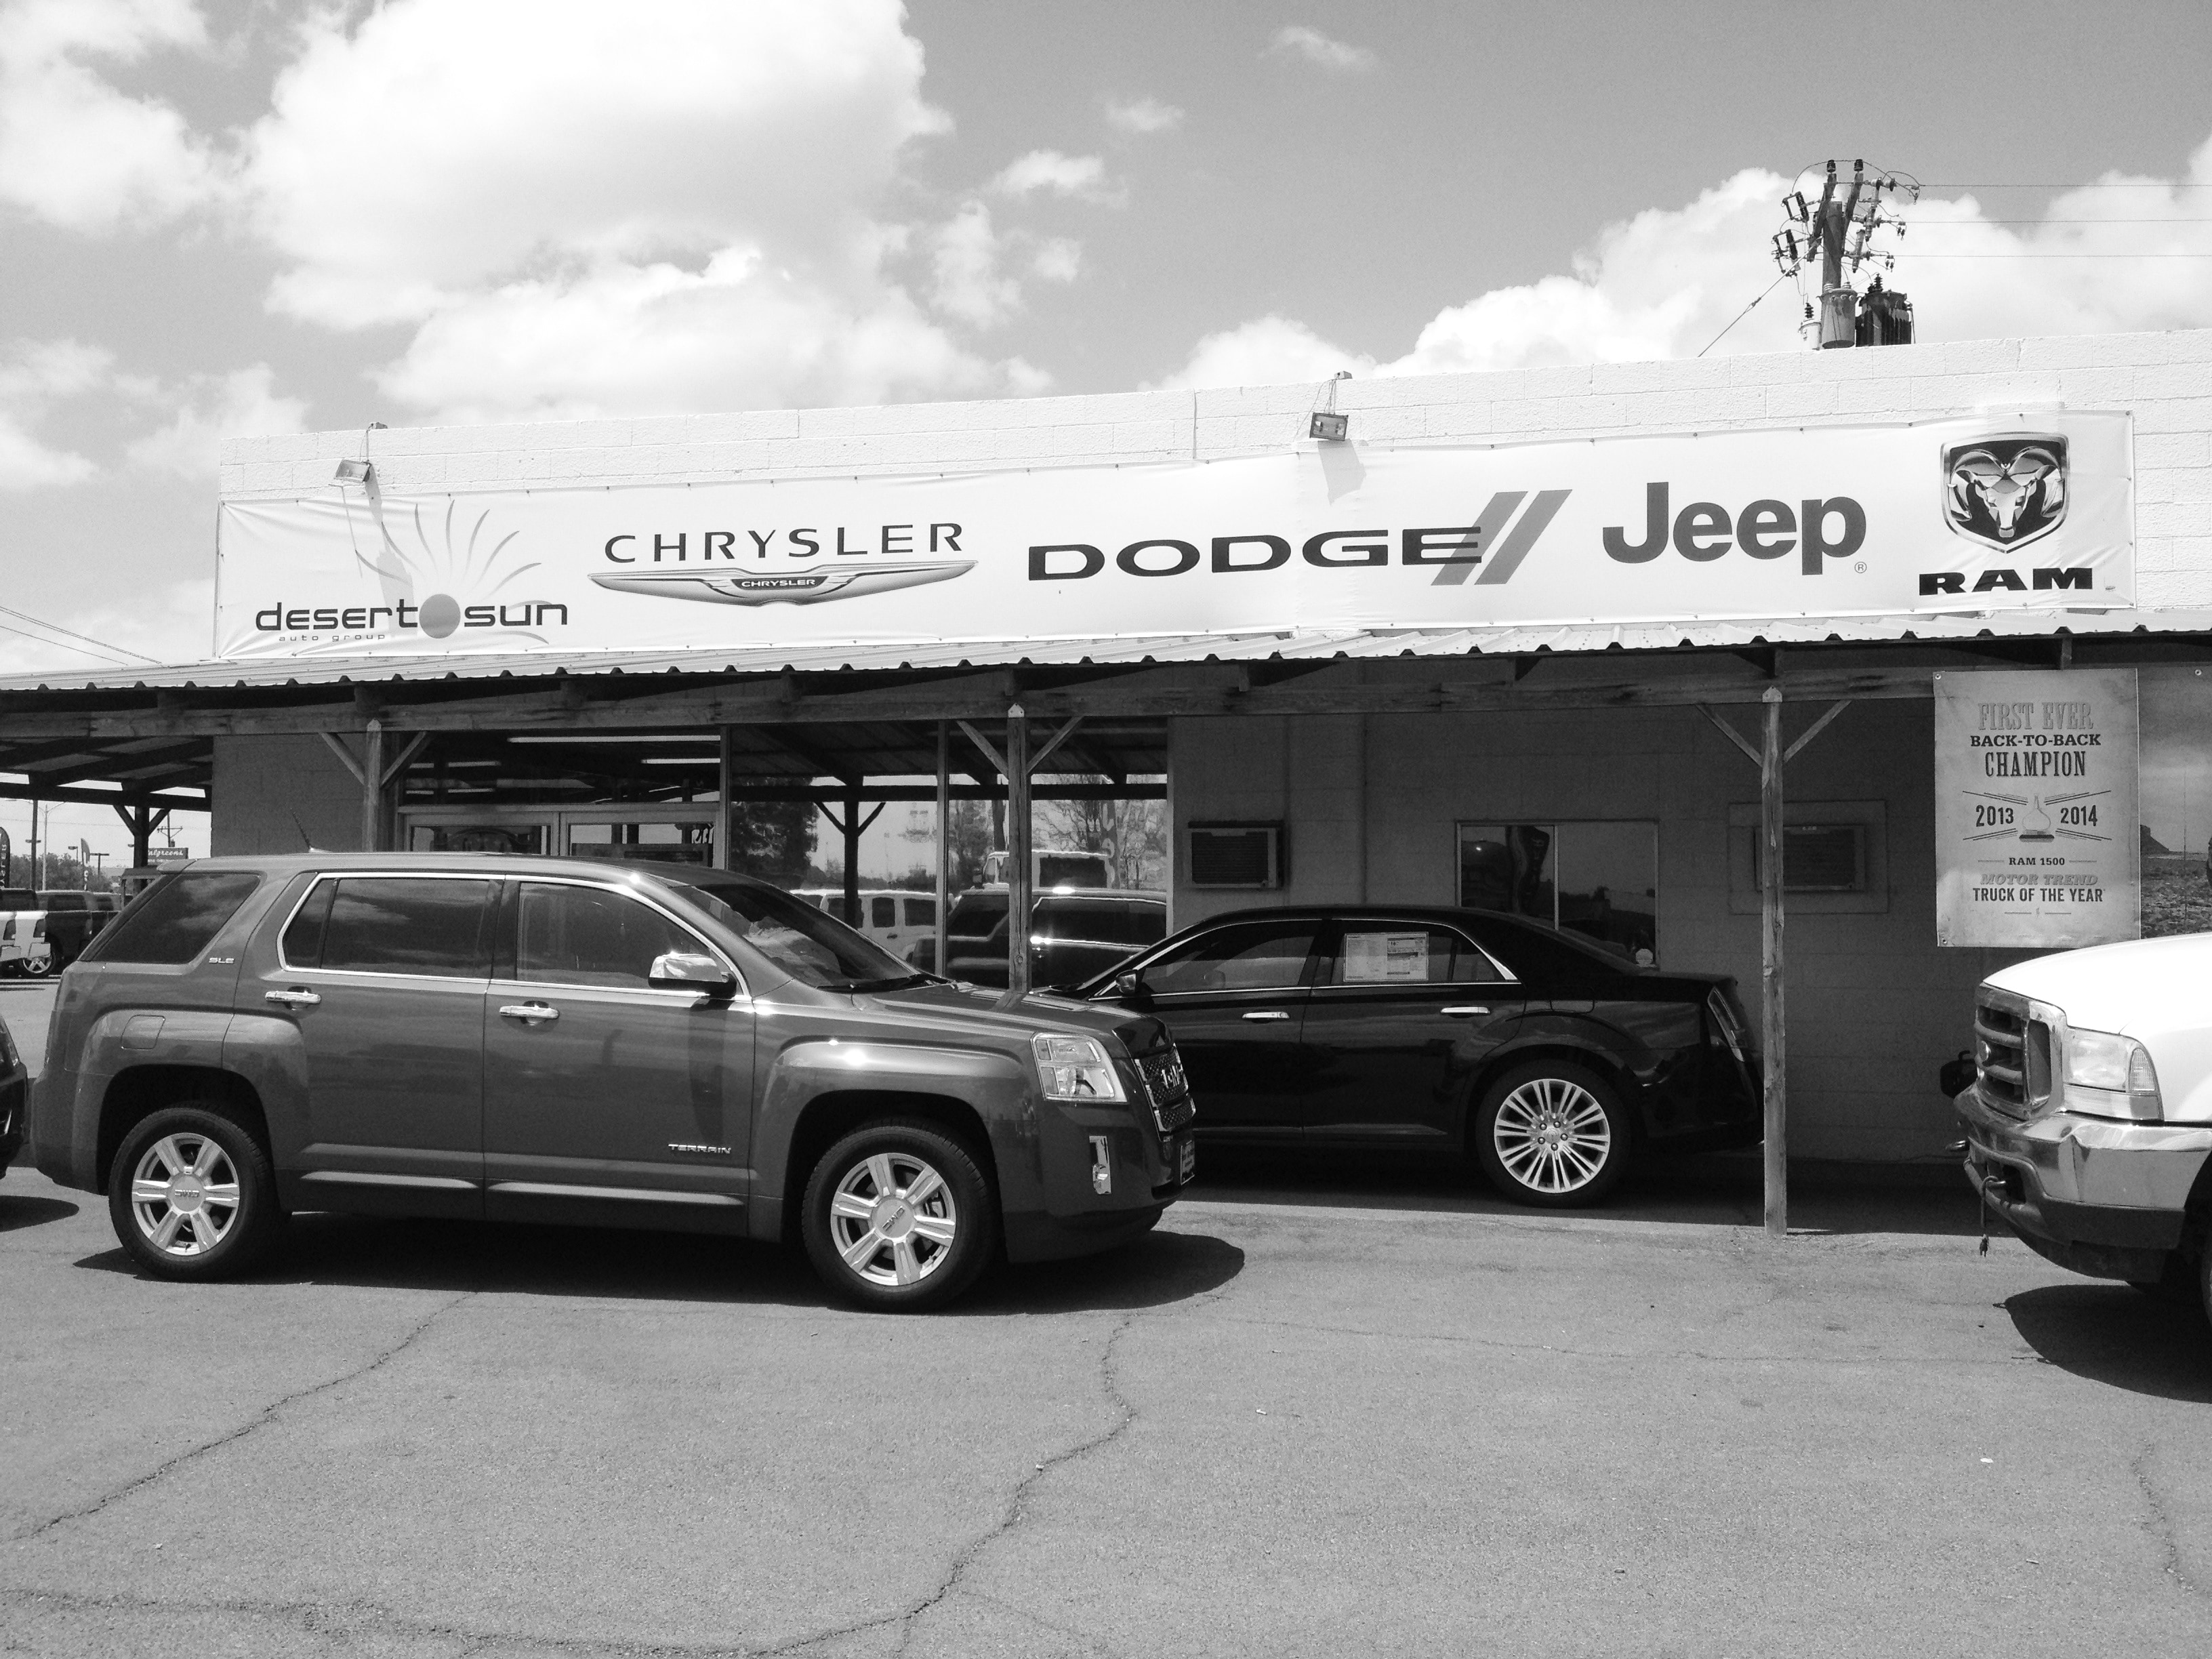 Desert Sun Gmc Roswell >> About Desert Sun In Roswell Nm New Used Chrysler Dodge Jeep Ram